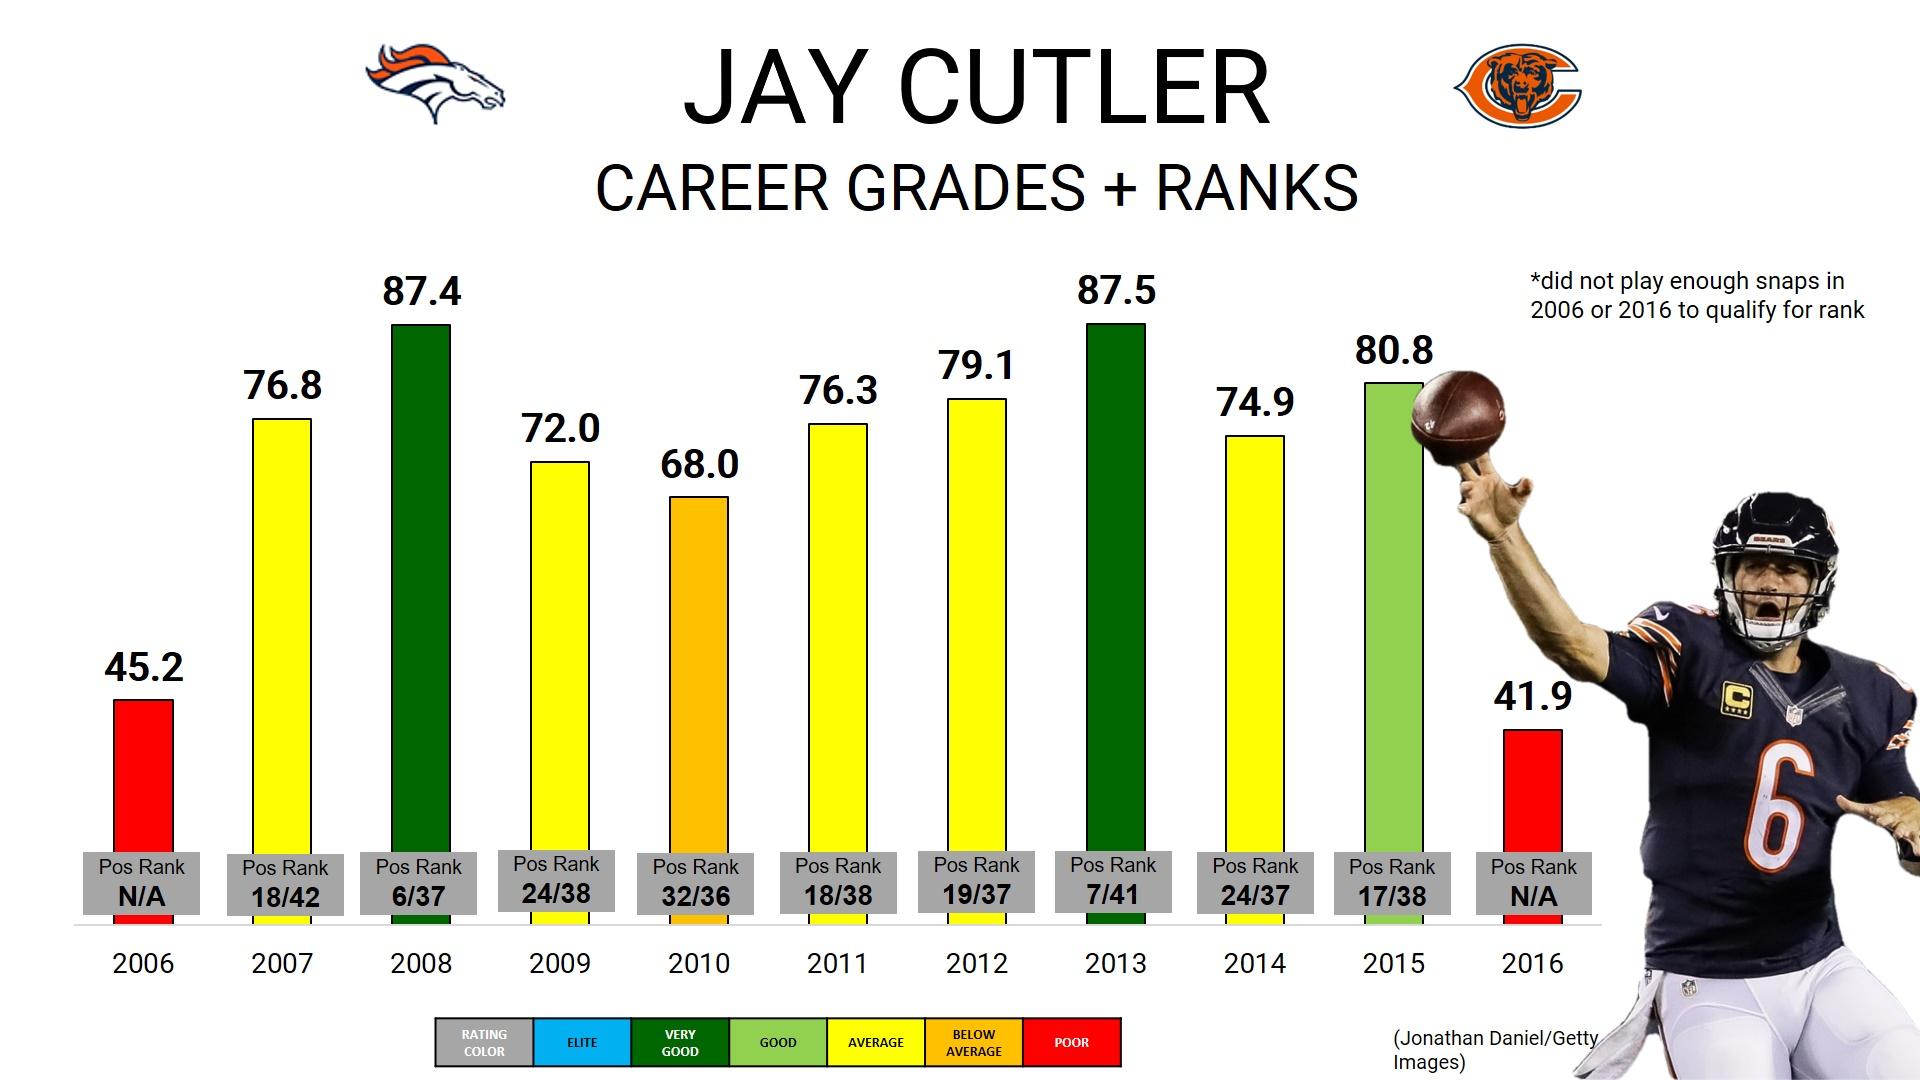 Jay Cutler Retires